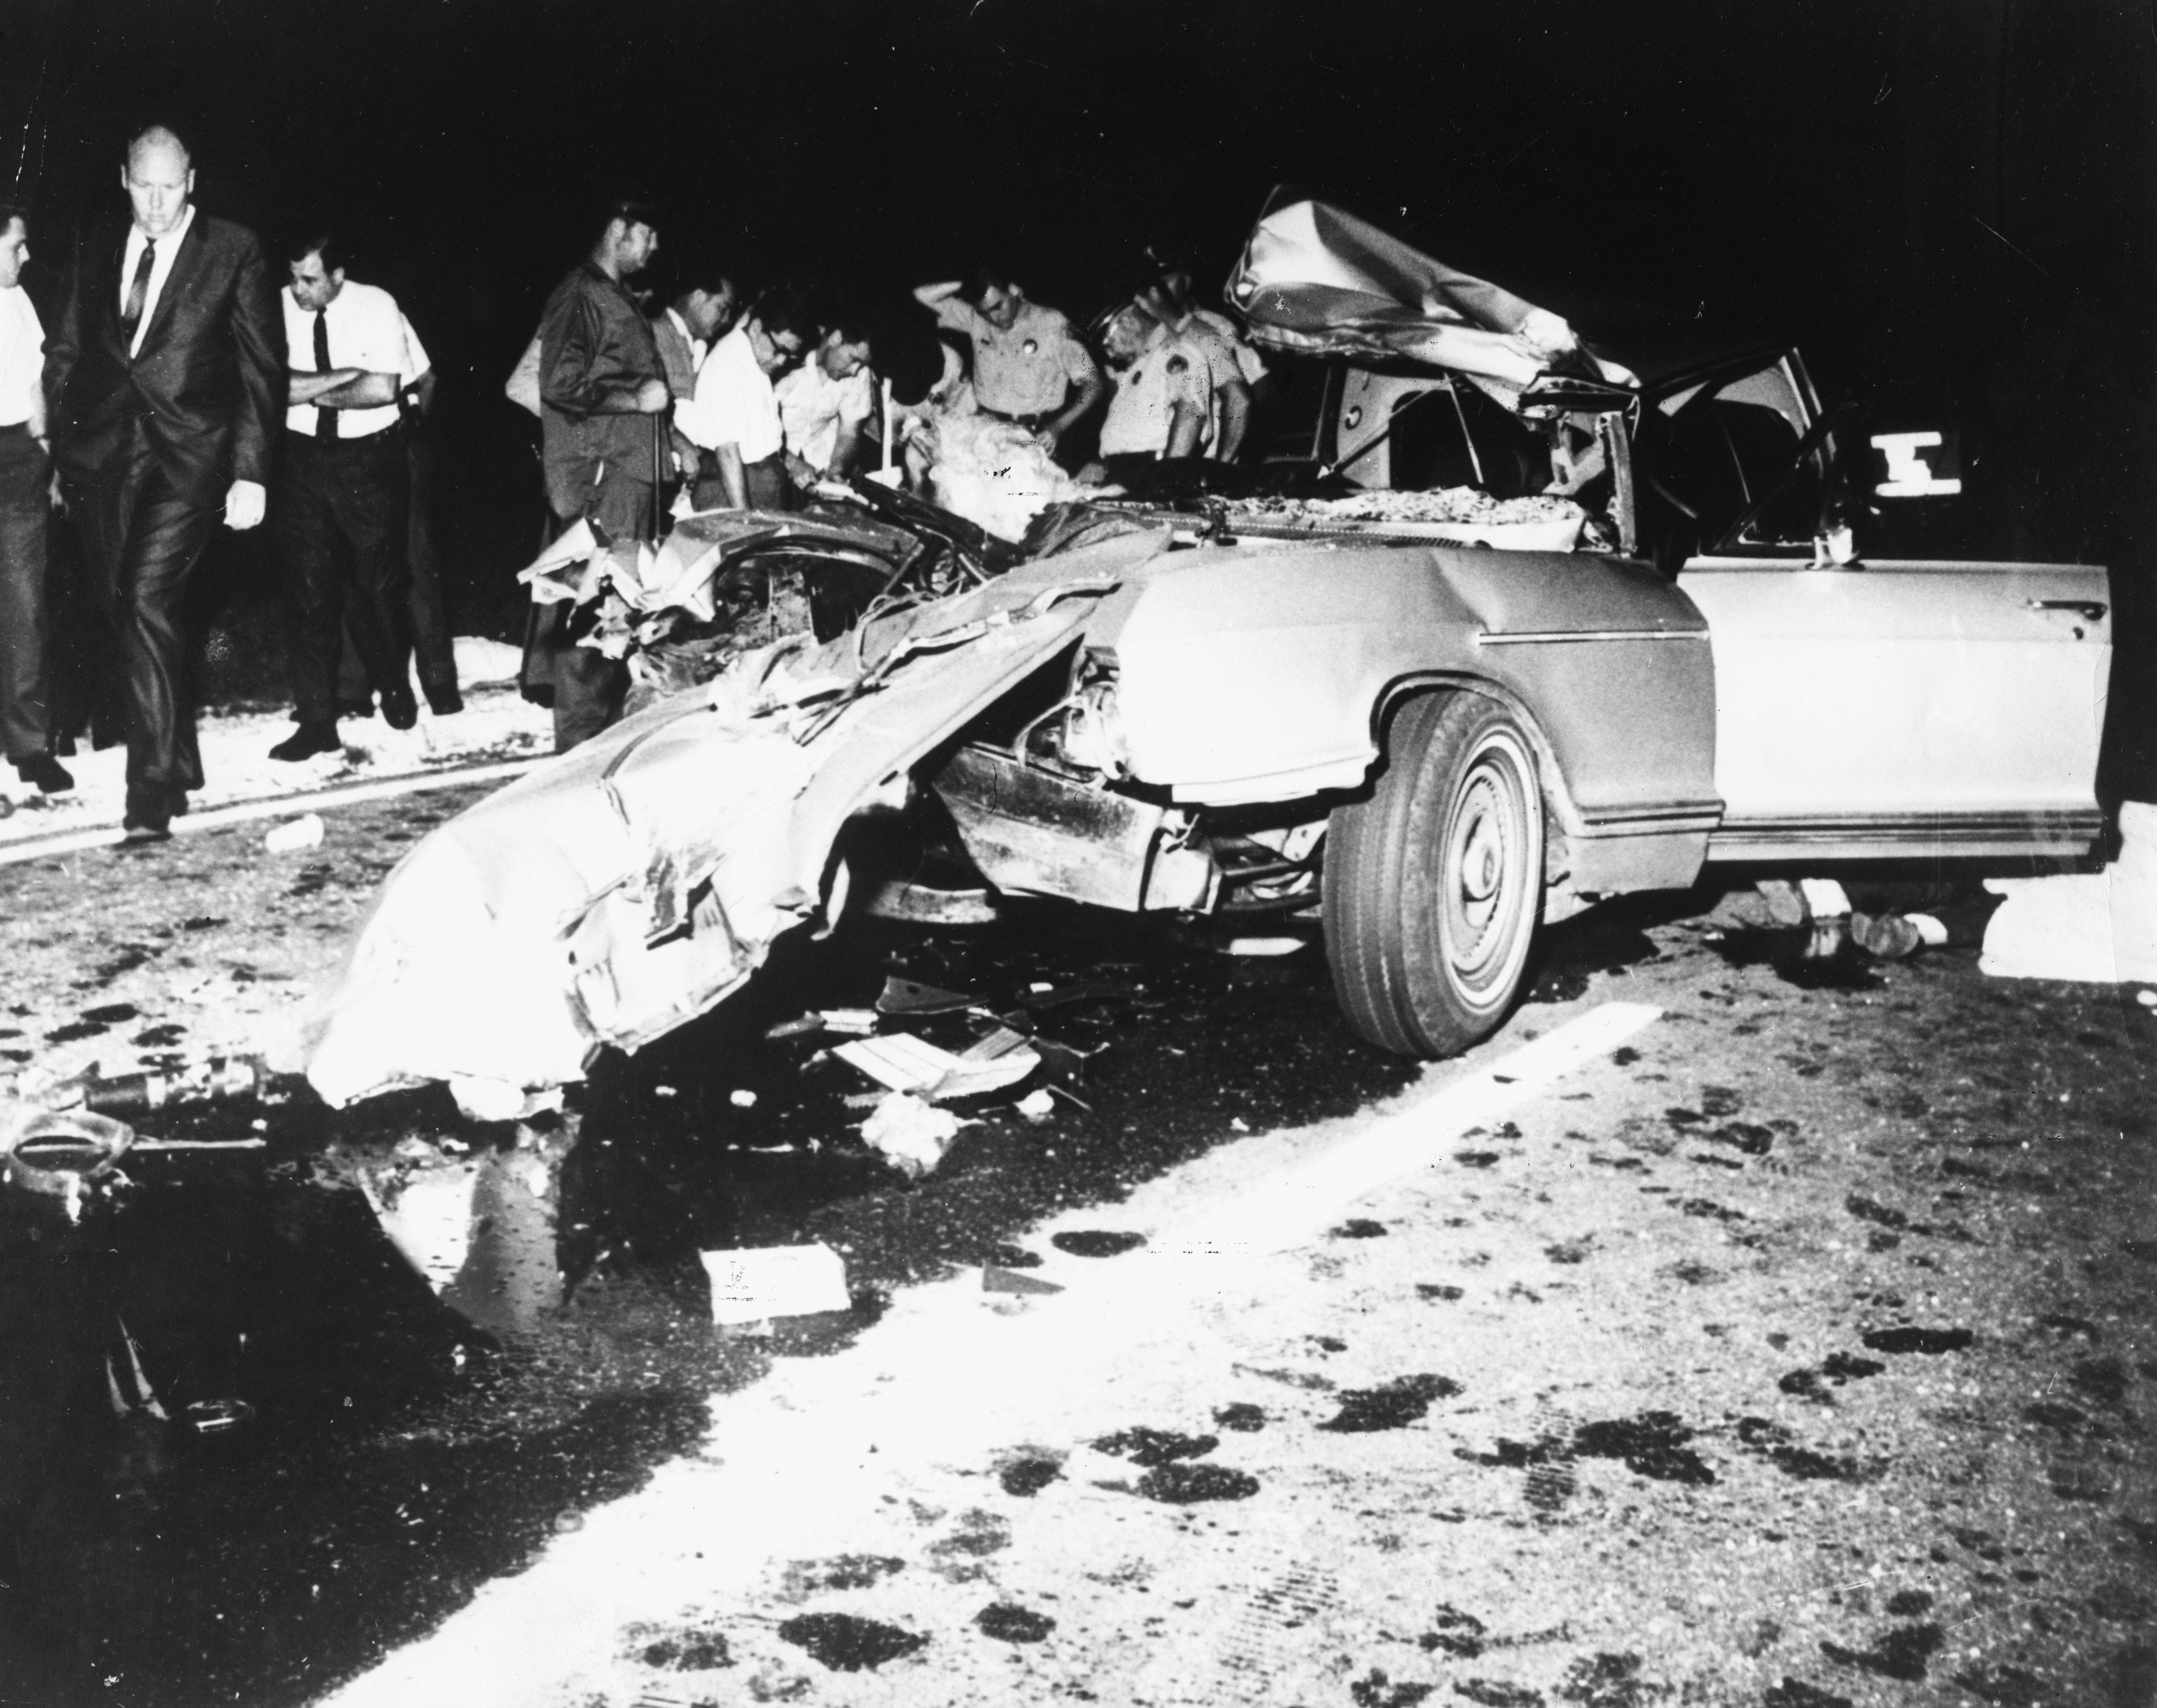 Random Details About Playboy Model's Fatal Car Crash Was So Brutal It Changed Federal Law Forever